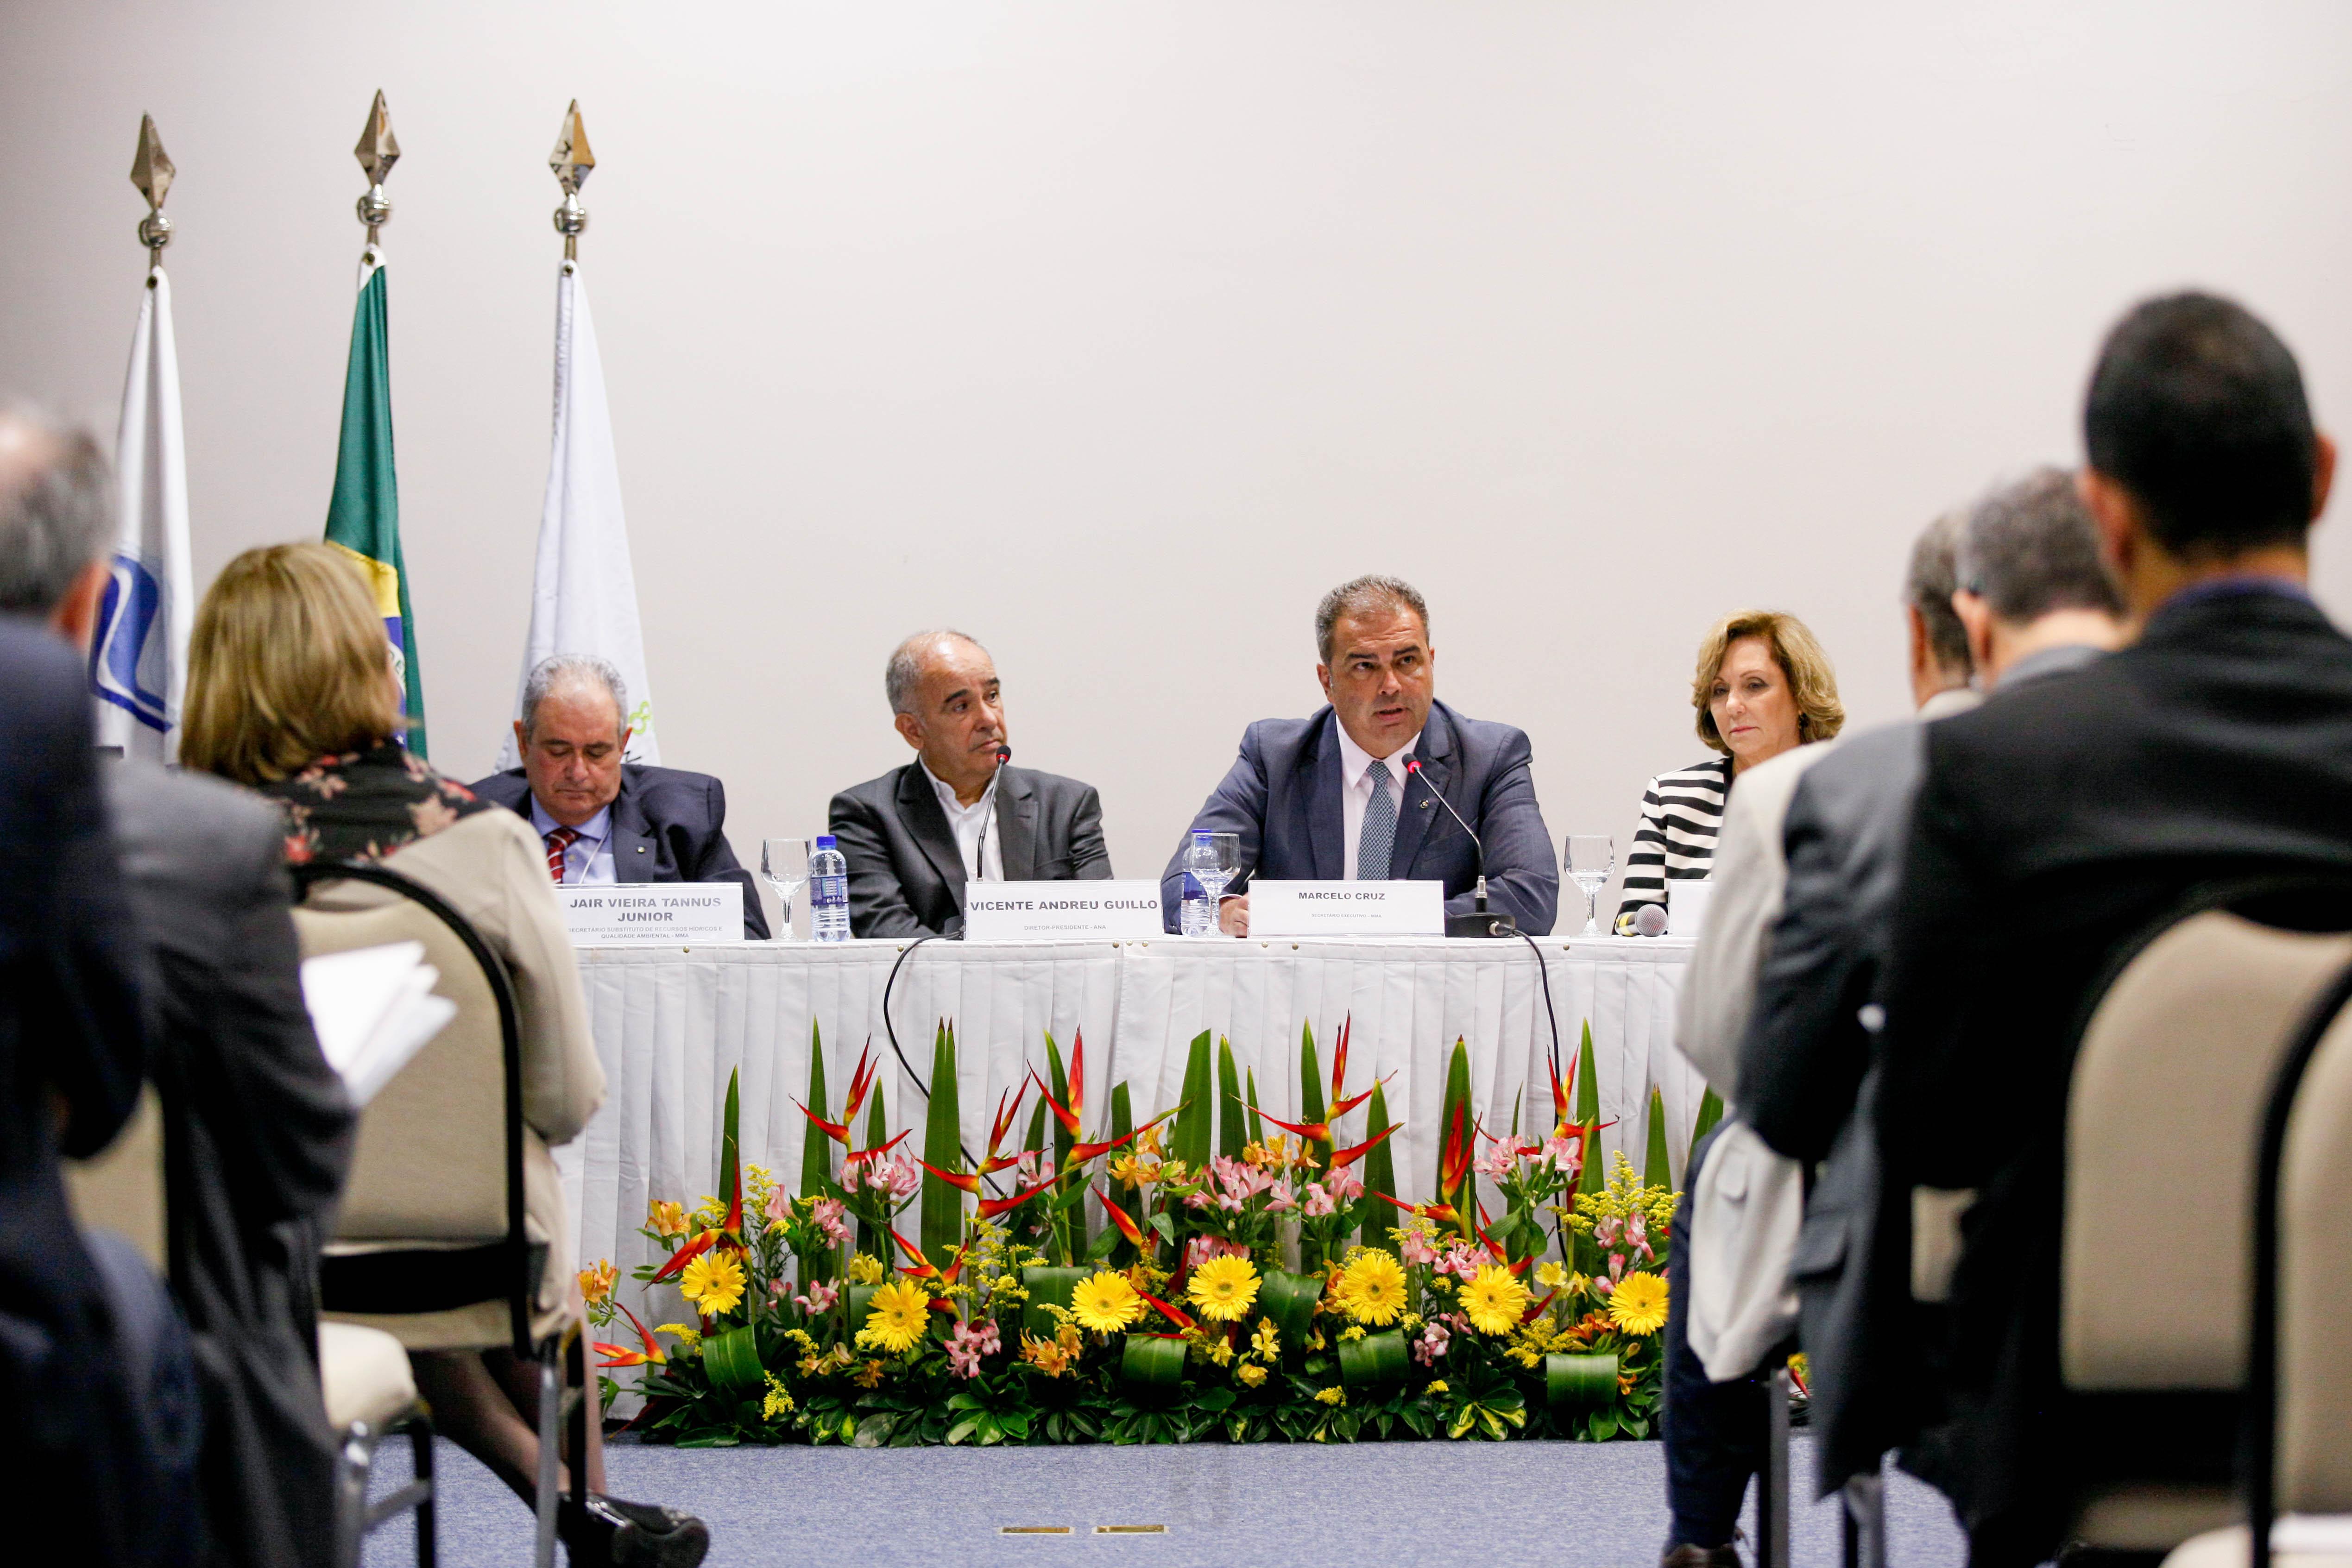 Água: Ministério investirá R$ 135 milhões